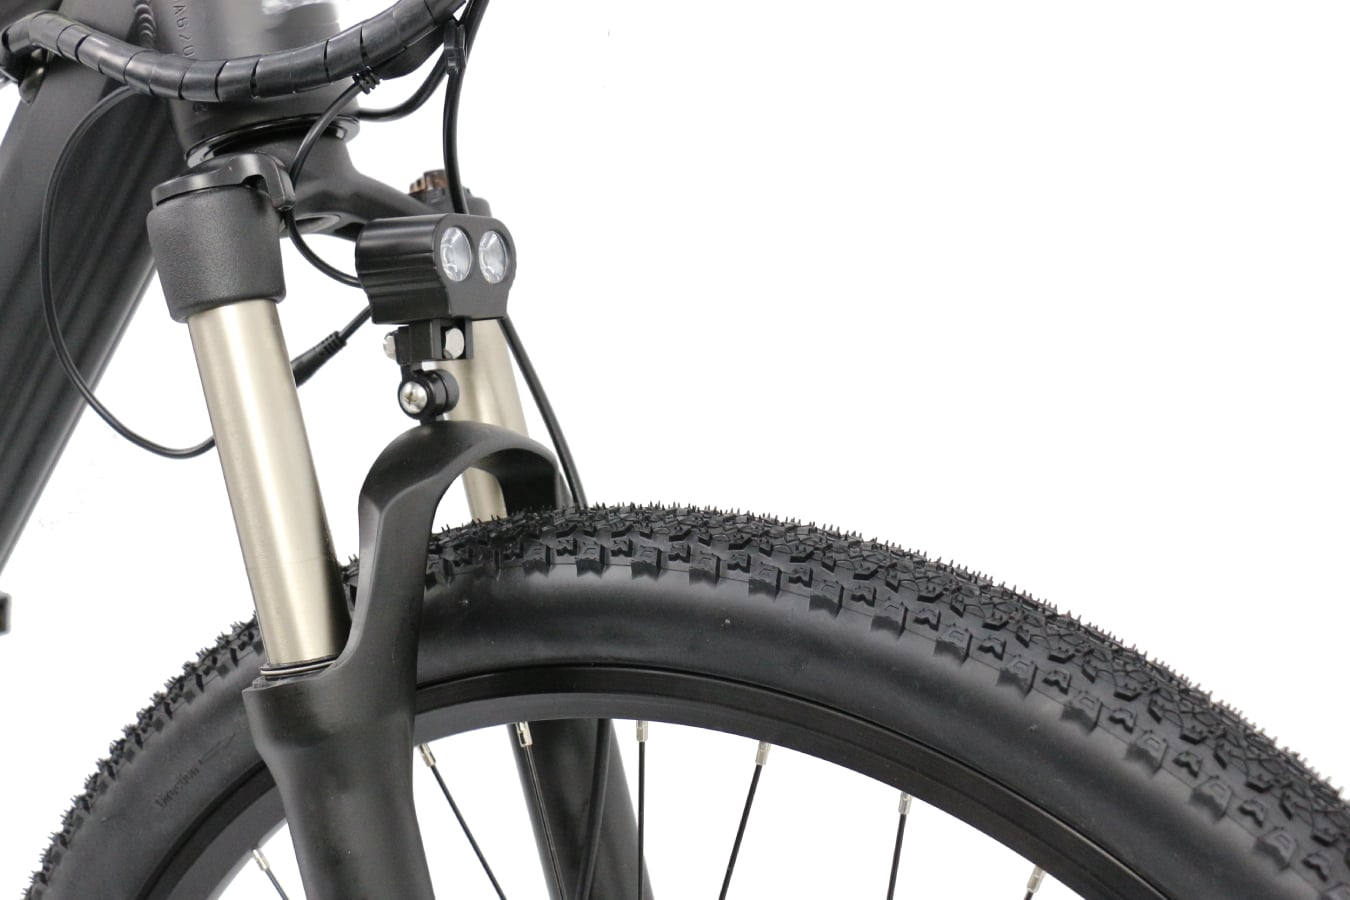 Weave Sport Front Headlight & Suspension